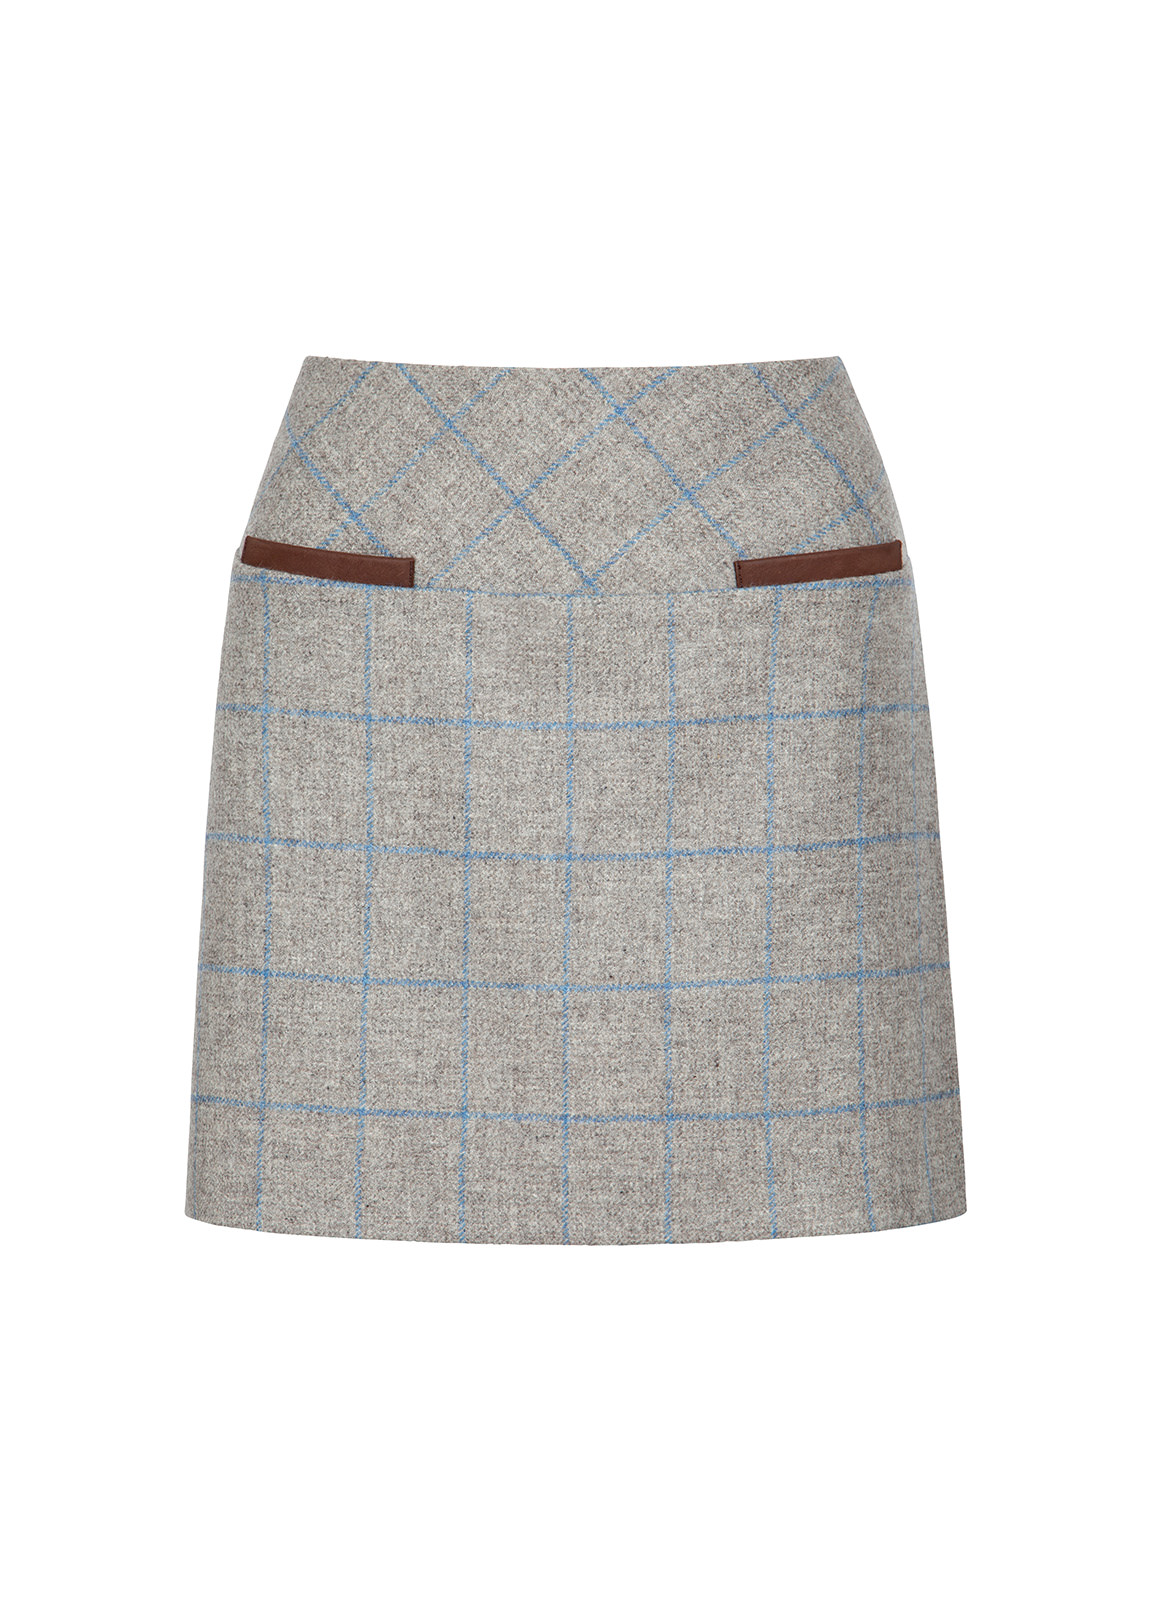 Dubarry_ Clover Tweed Mini Skirt - Shale_Image_2